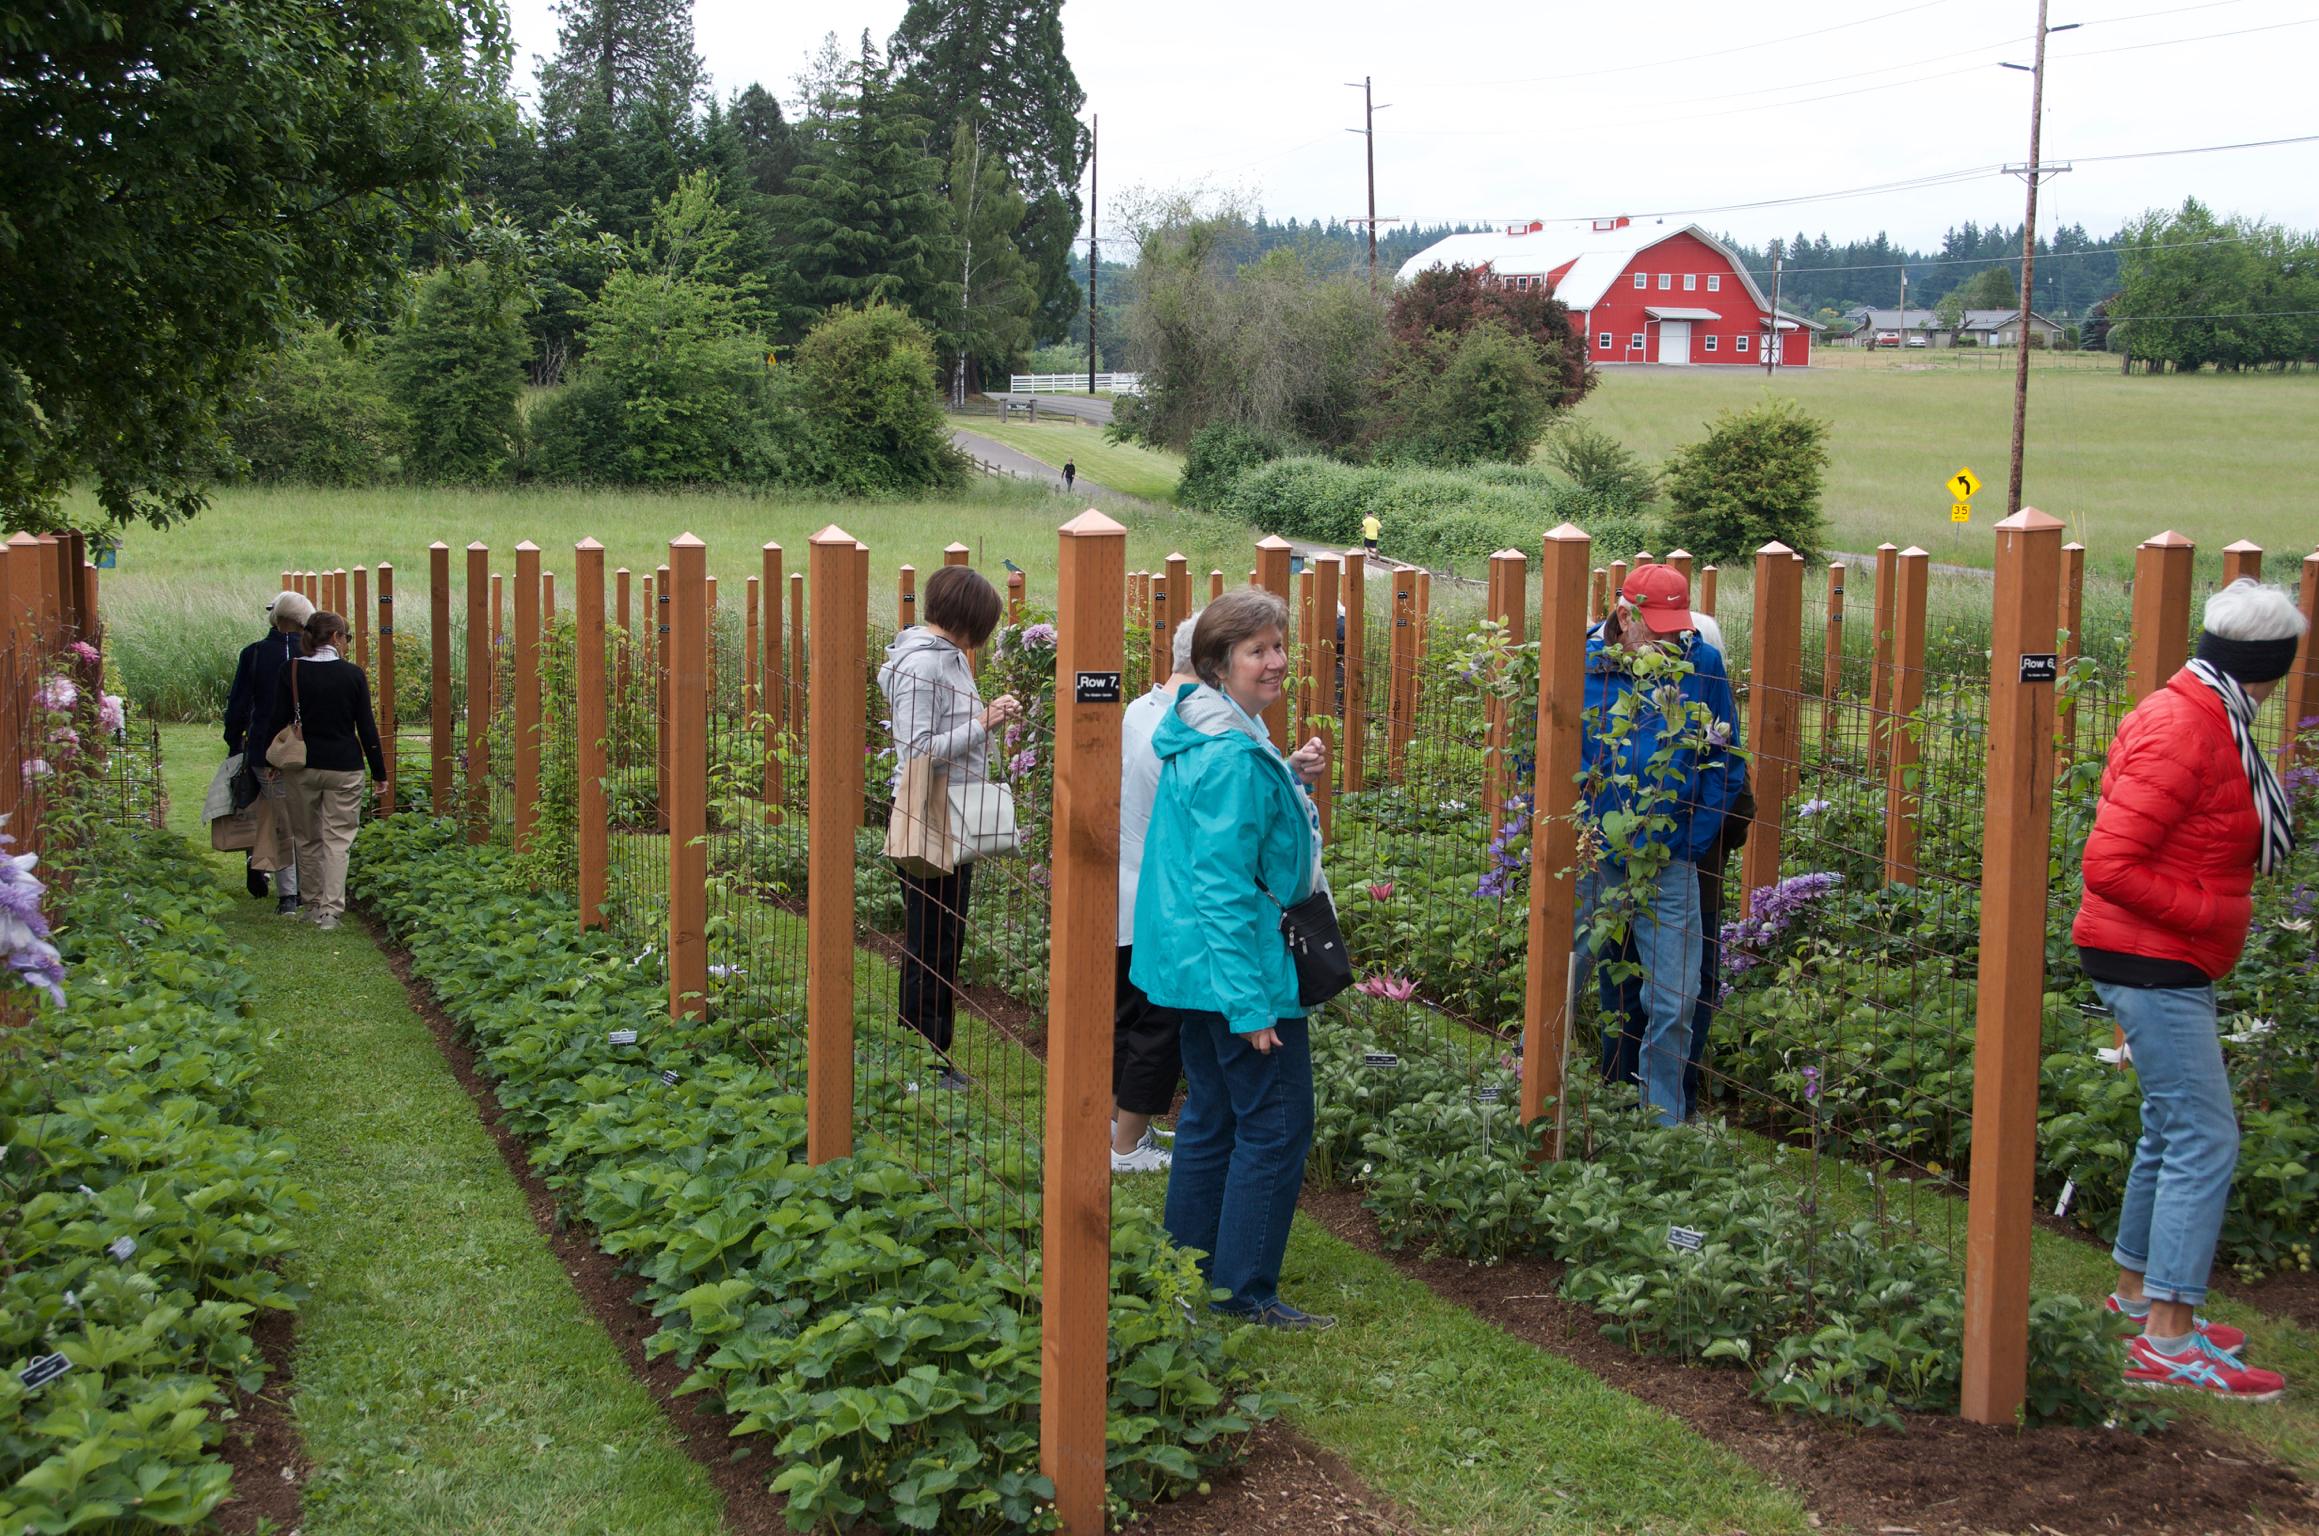 Clematis garden tours feature tours, speakers, silent auction